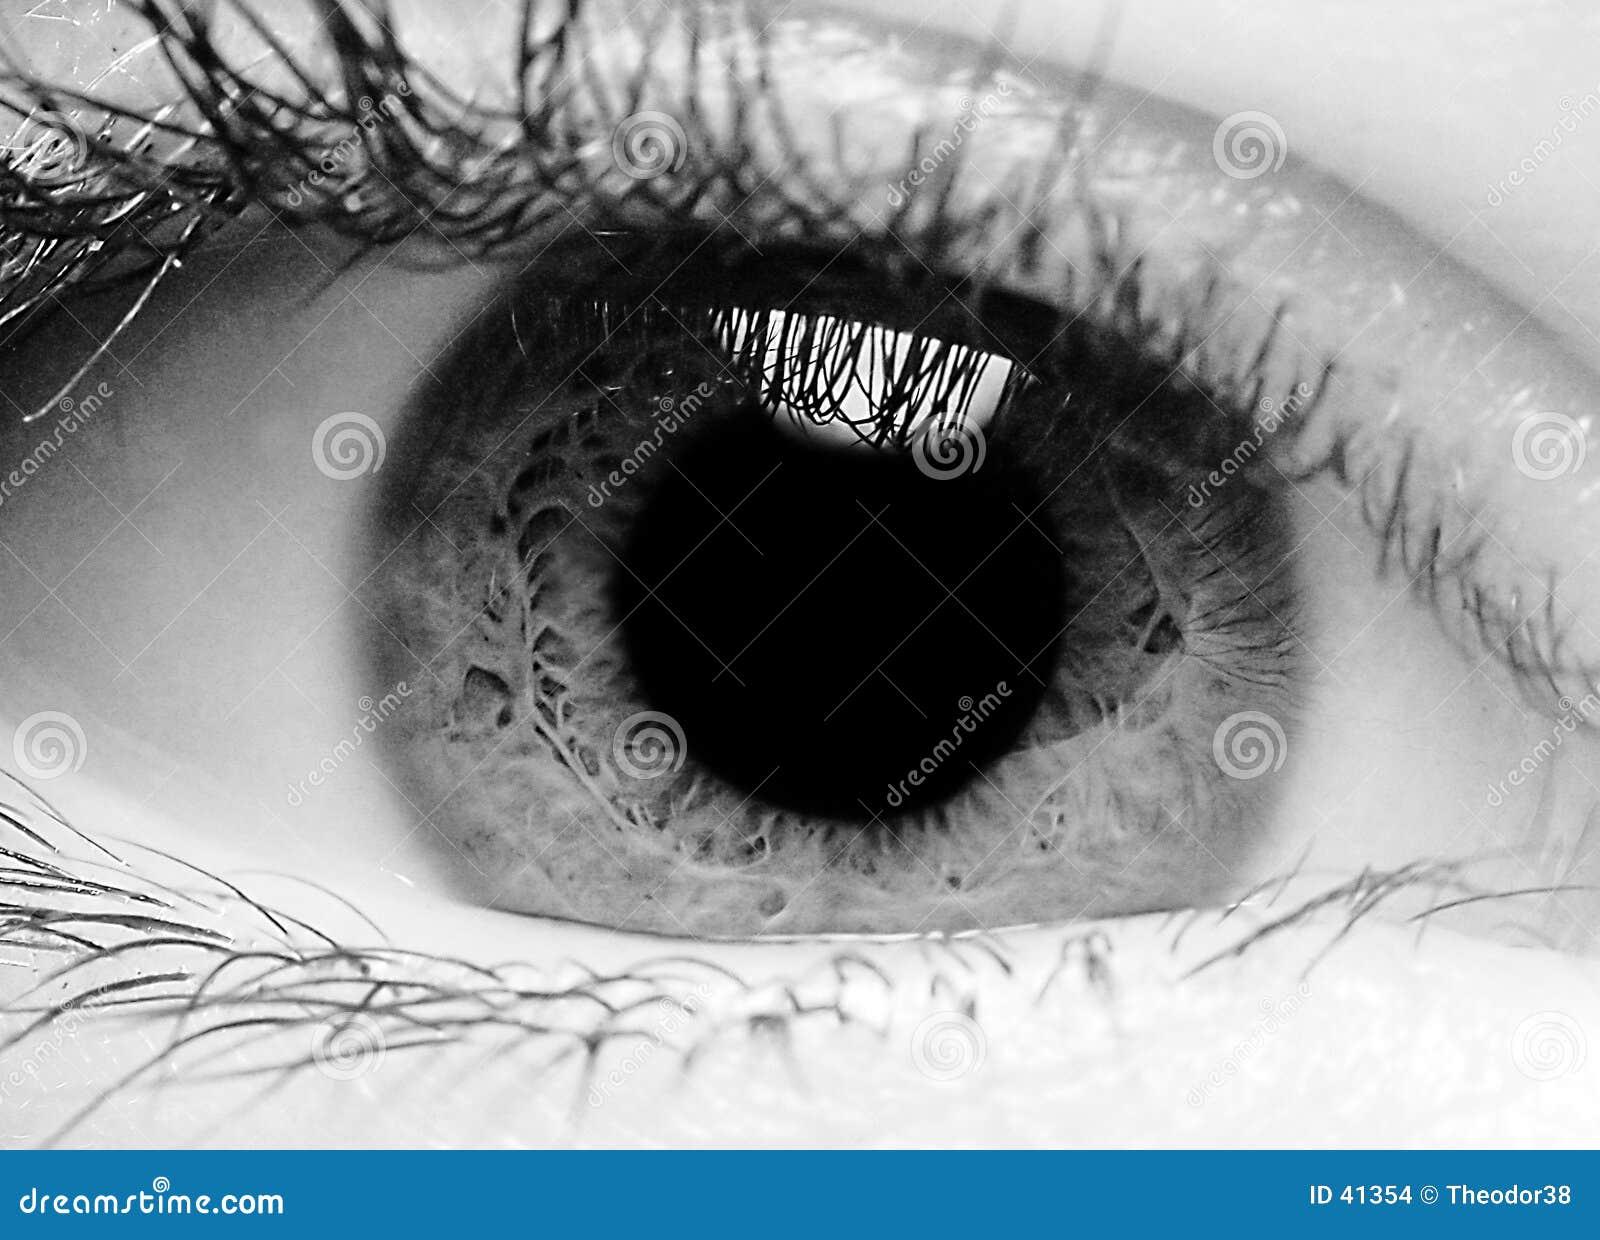 Closeup of an eye